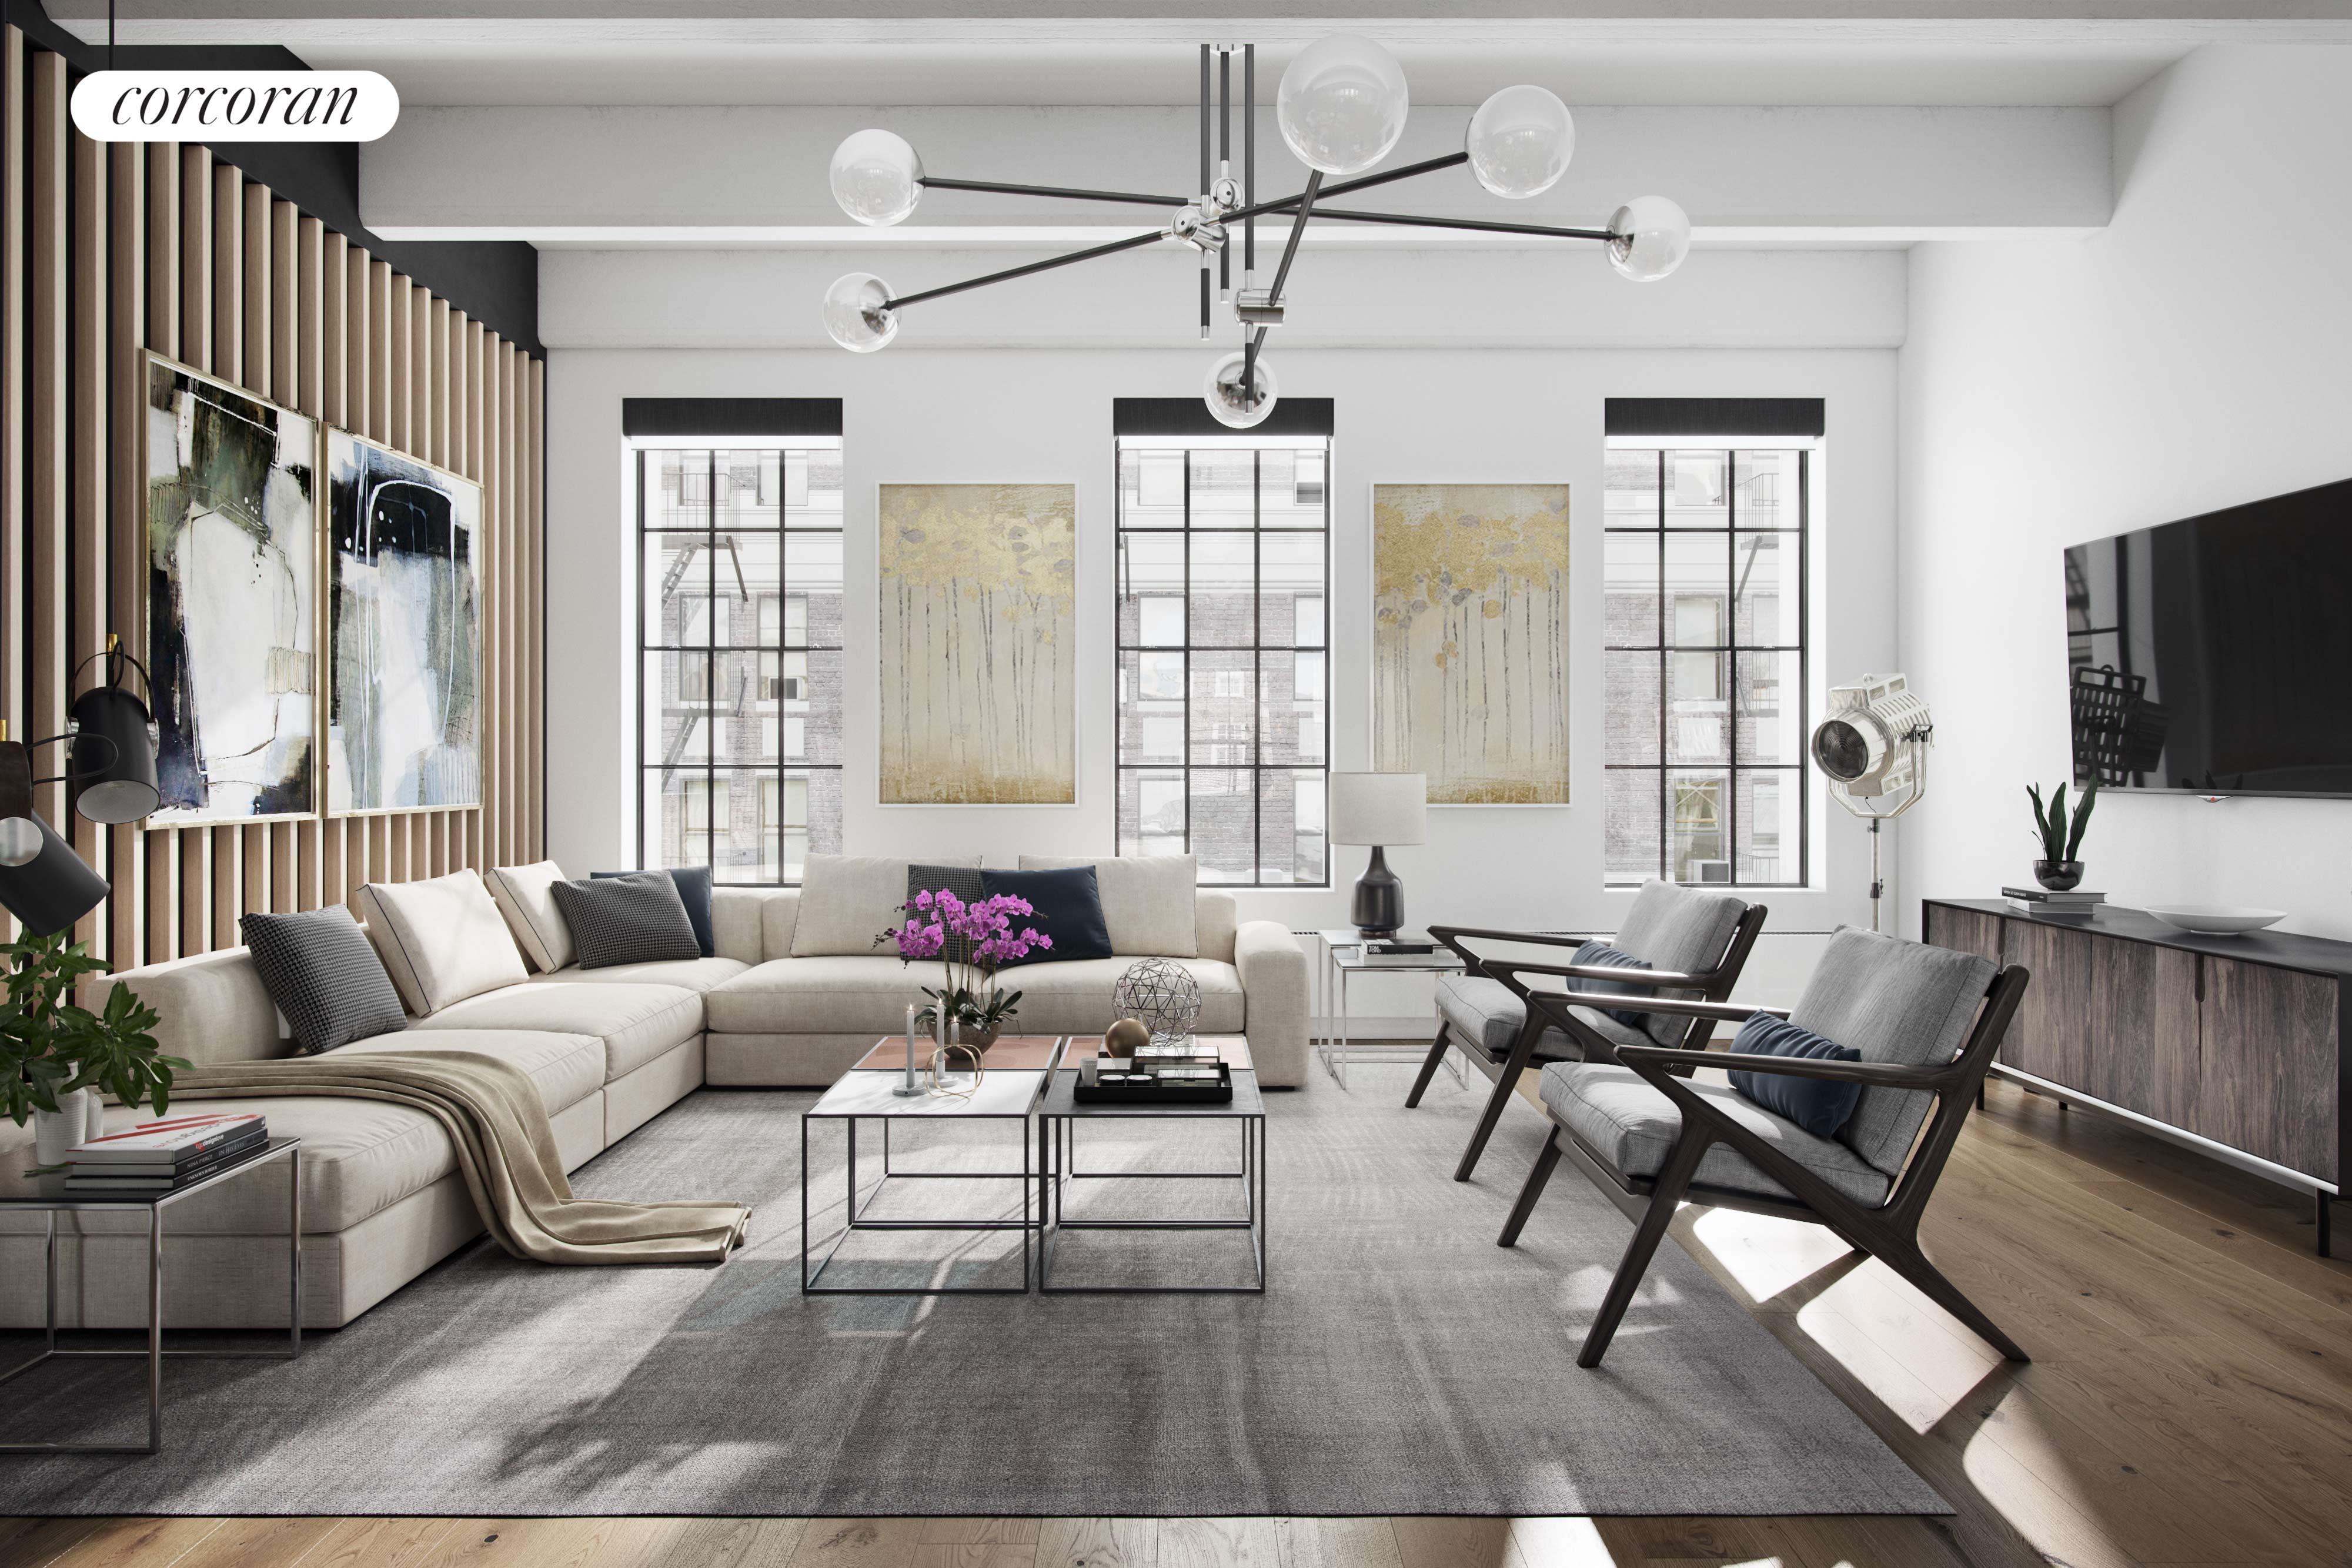 Corcoran, 40 RENWICK ST, Apt. 3rdFloor, Soho/Nolita Real Estate ...